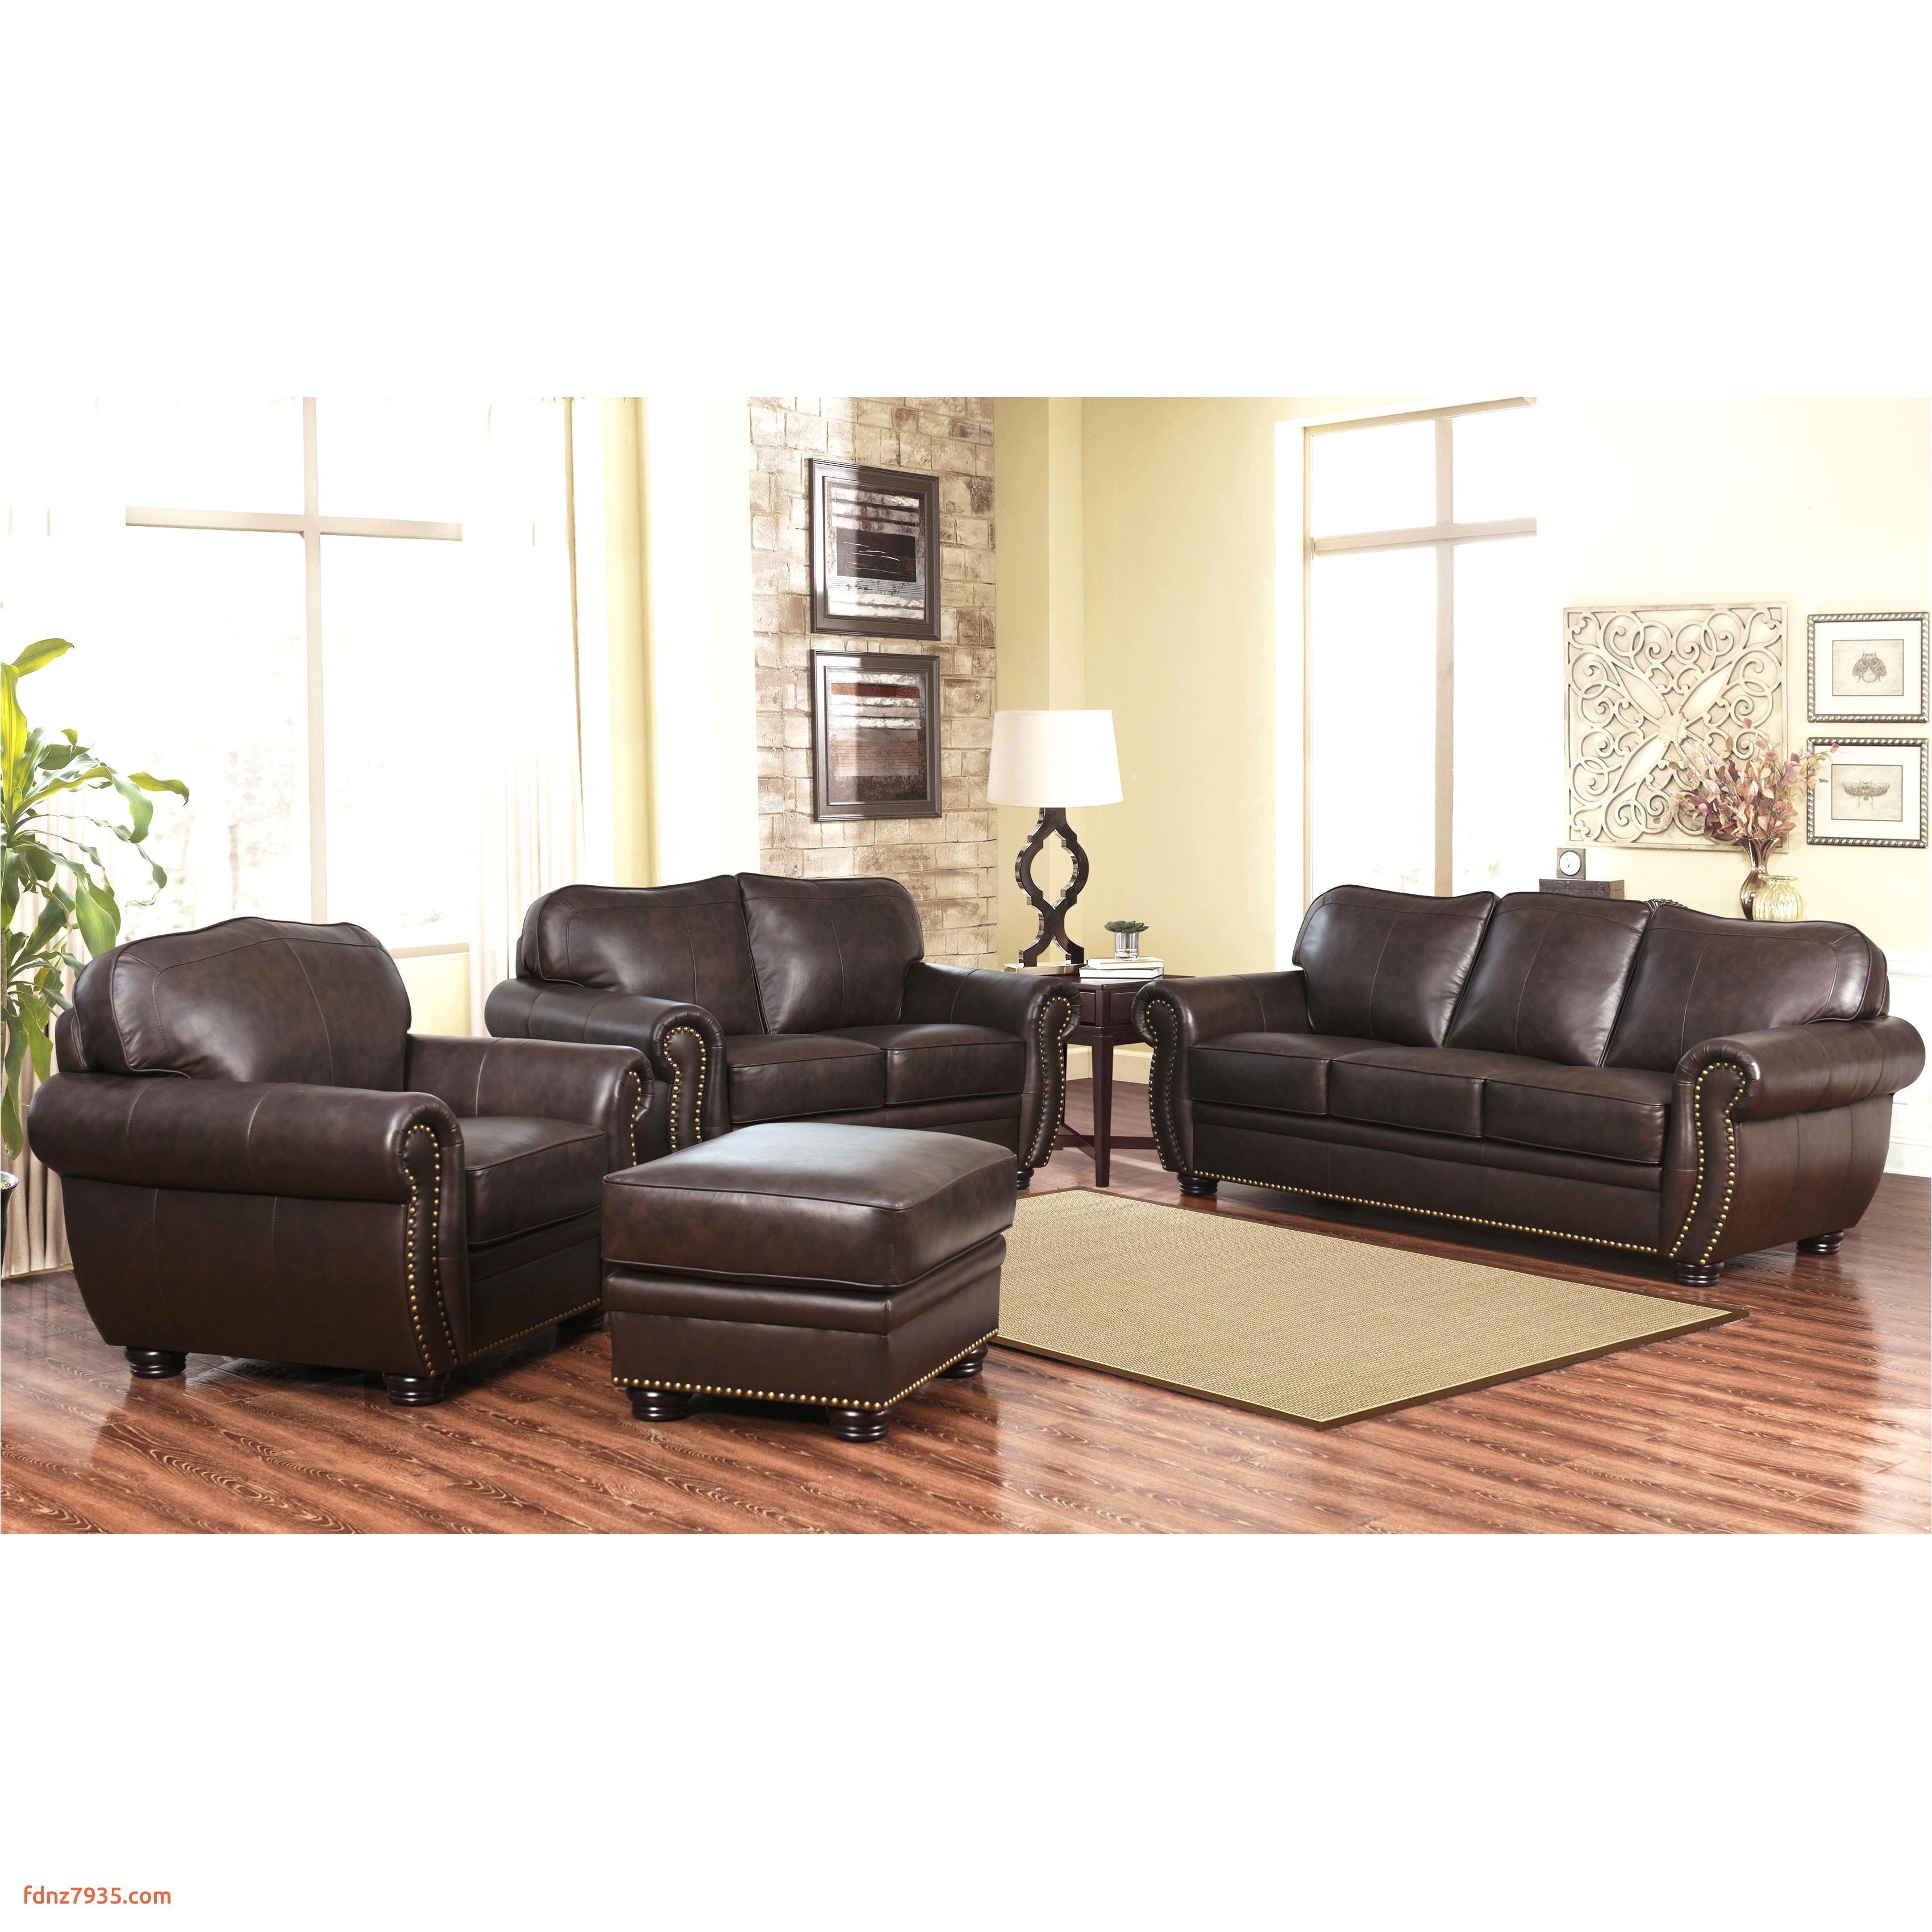 sofa and recliner beautiful sofa for small living room sofa allegria od primavera furniture